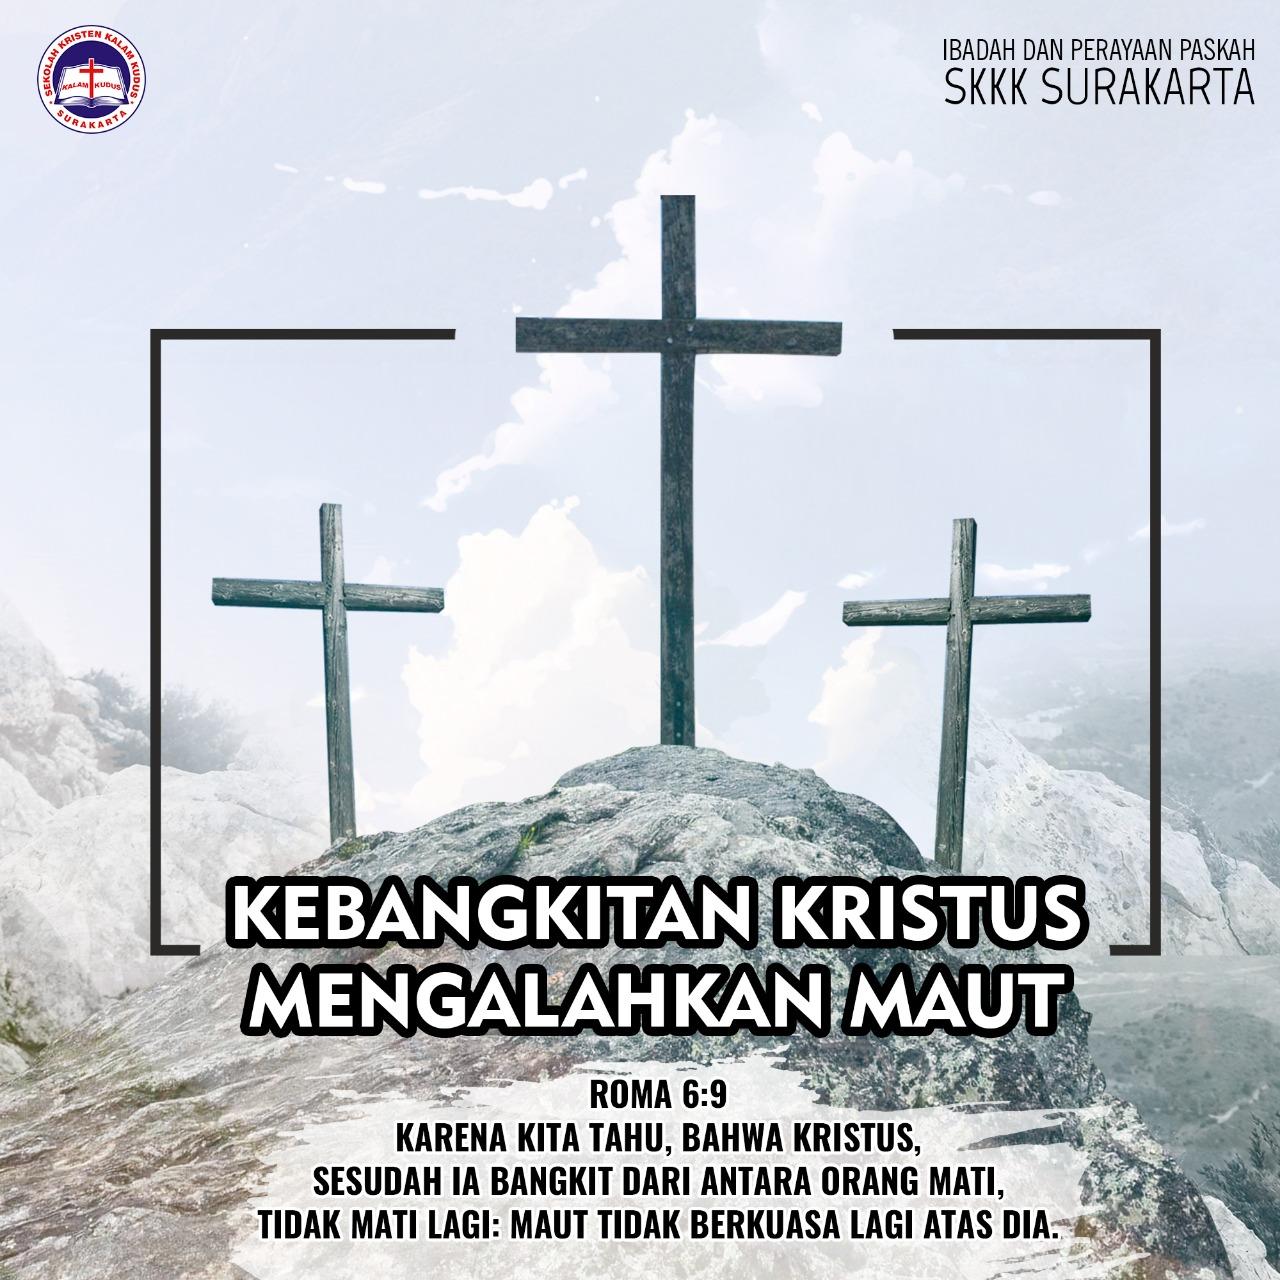 Mari Bersama Rayakan Paskah IP - SMP Kristen Kalam Kudus Surakarta